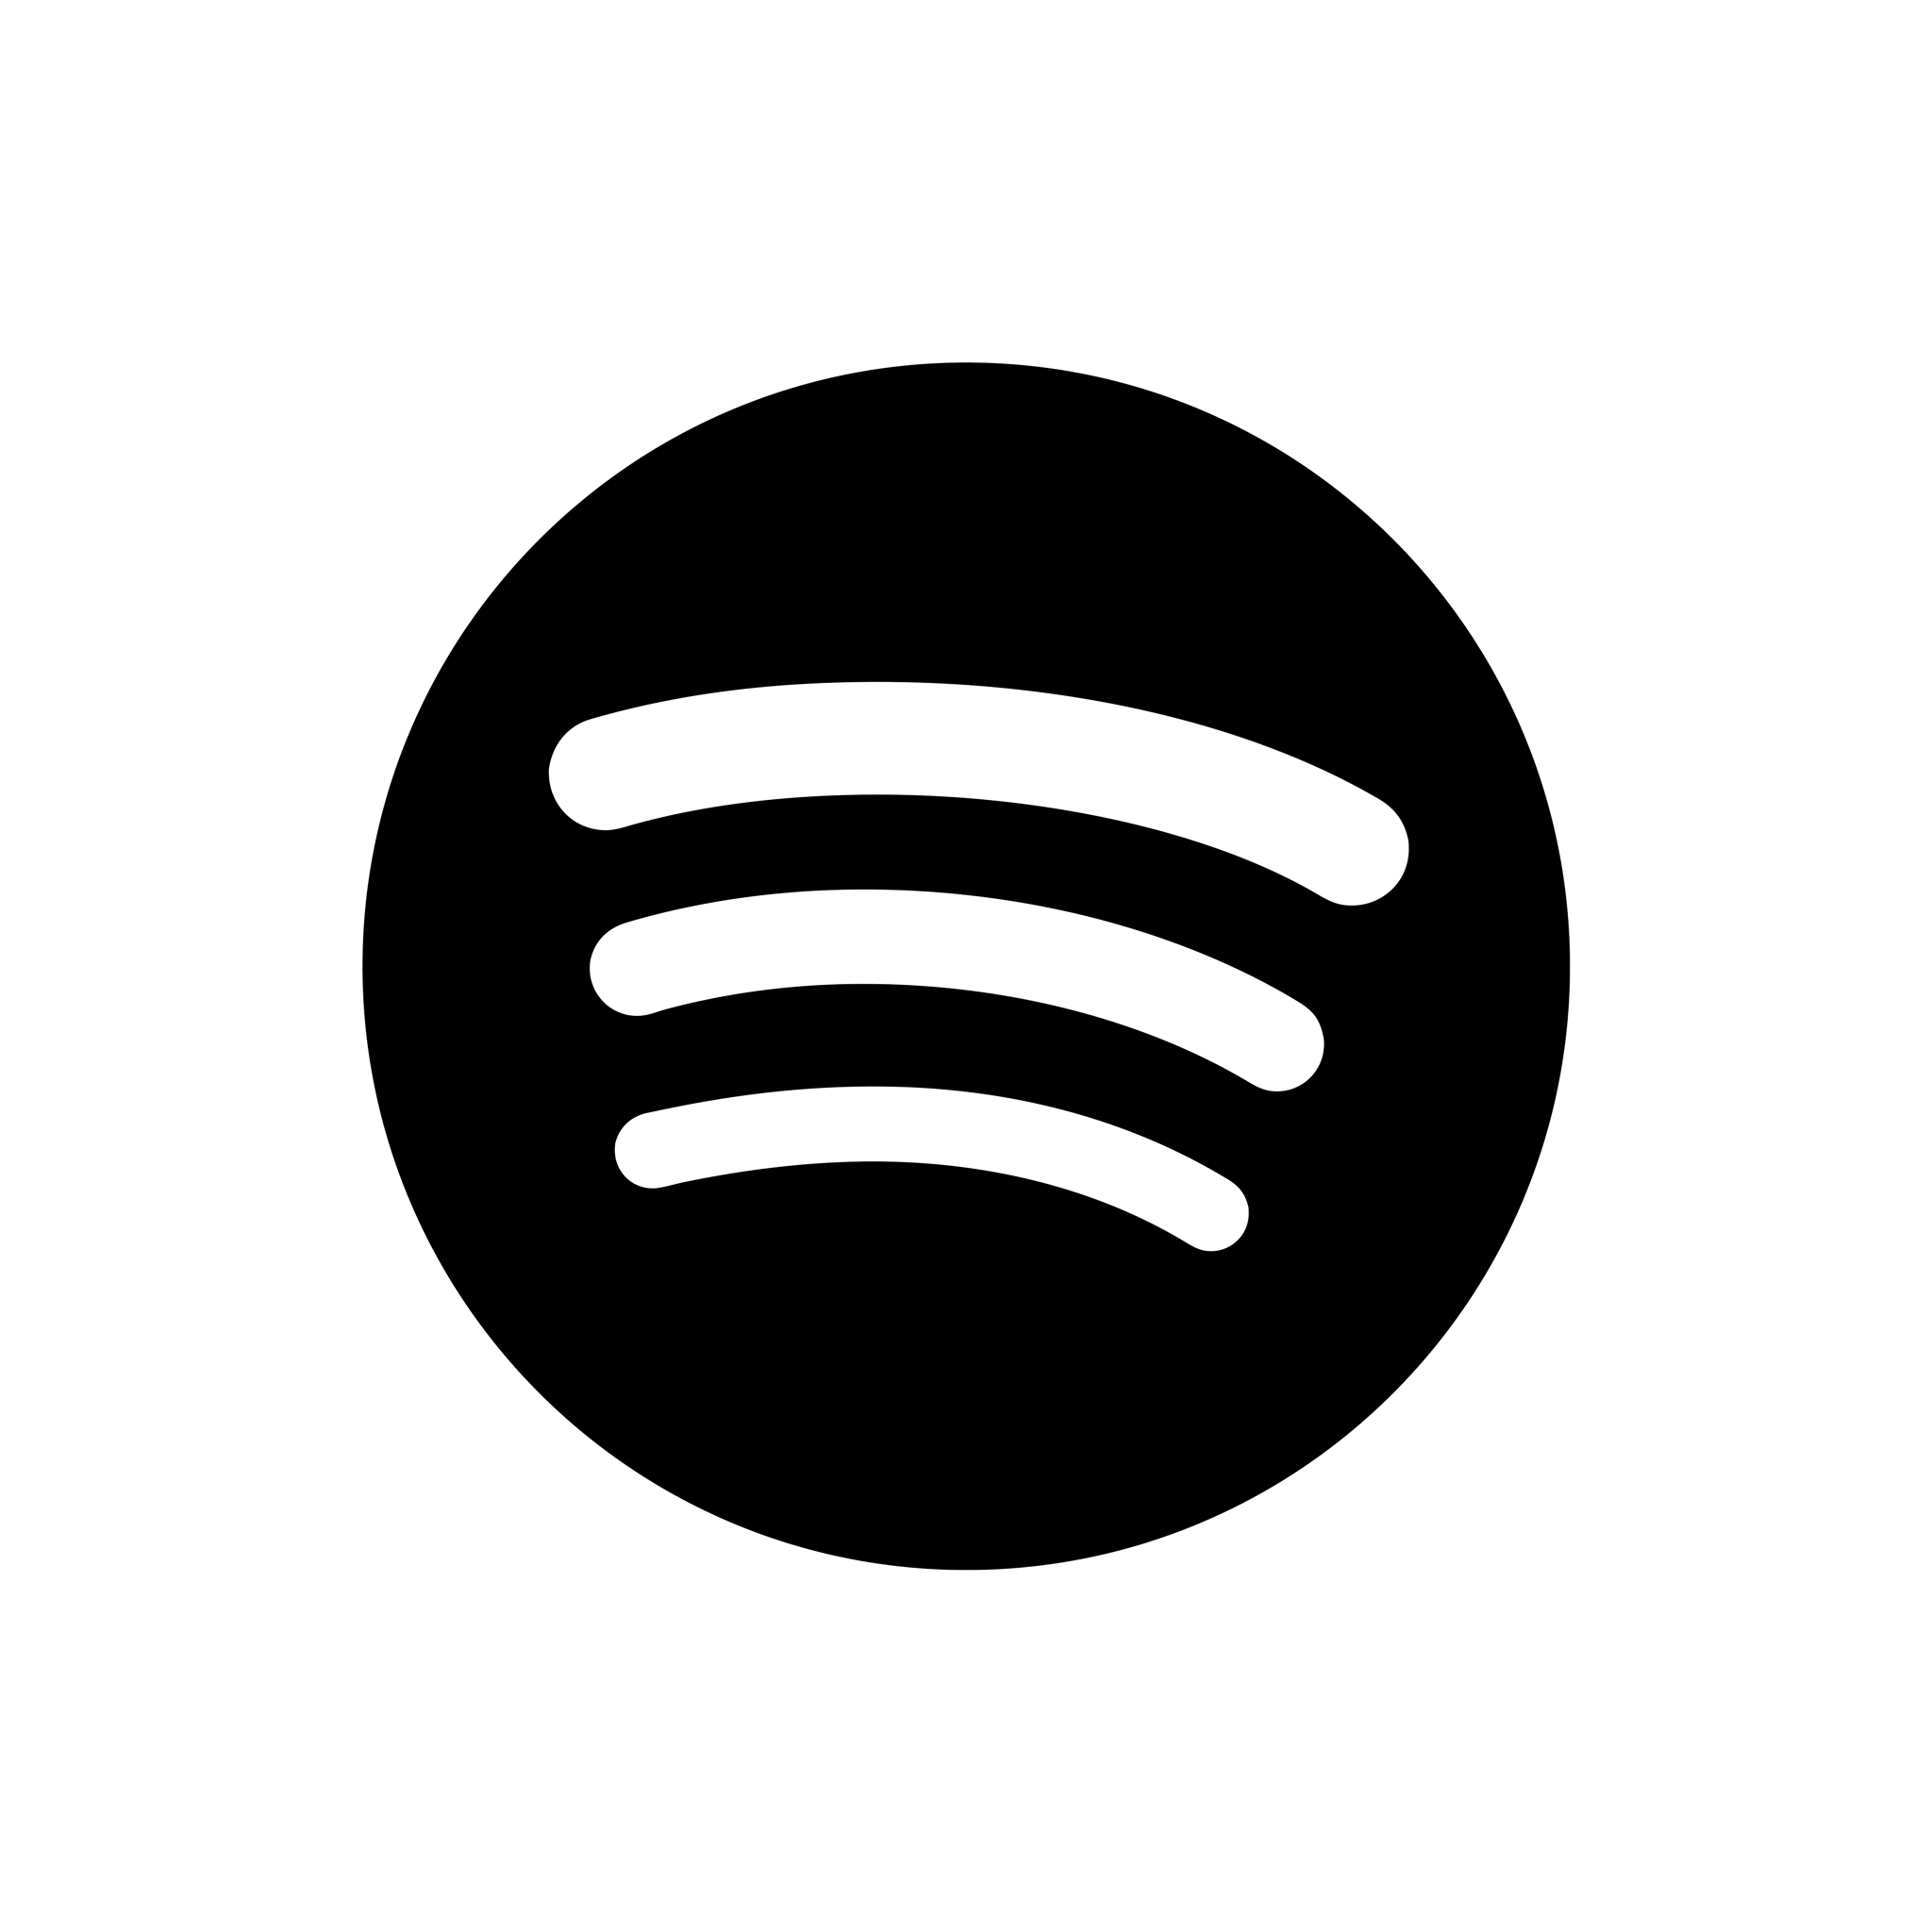 Transparent Background Vector High Resolution Spotify Logo - Spotify Logo TRANSPARENT White